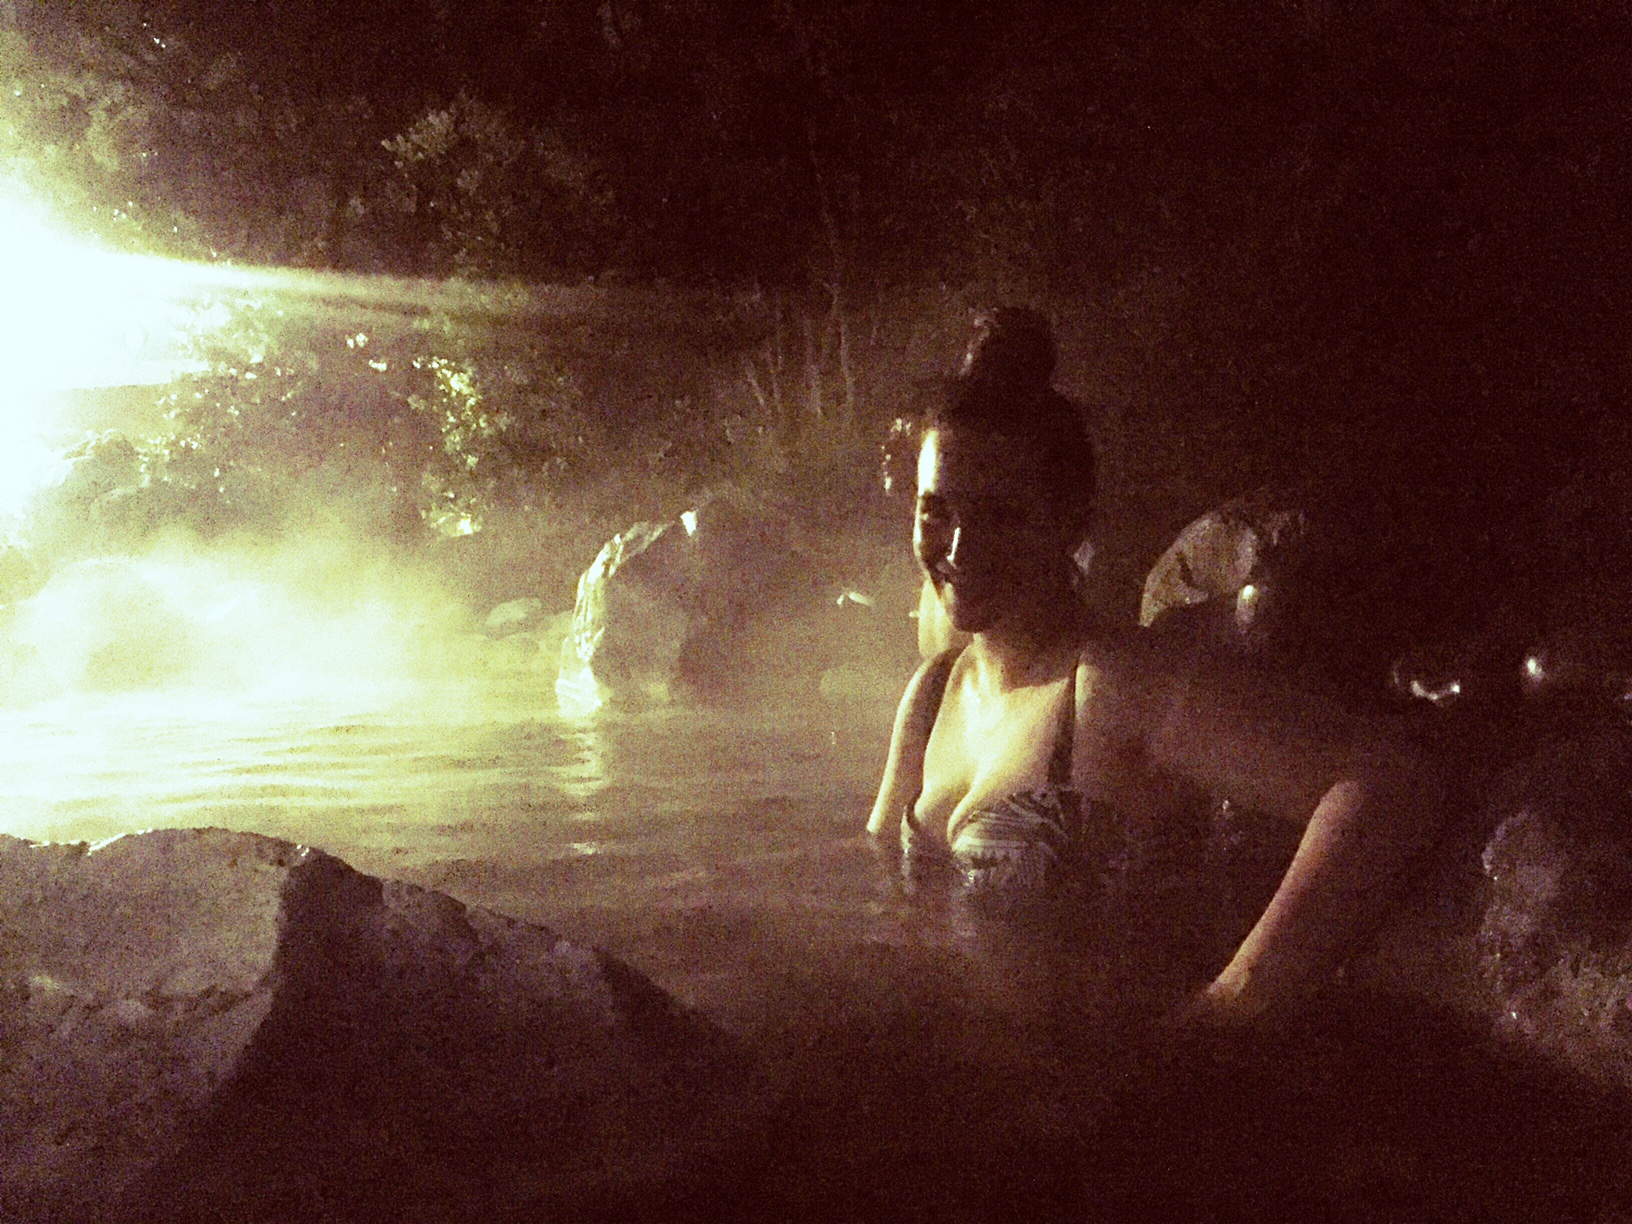 soaking in the moonlight